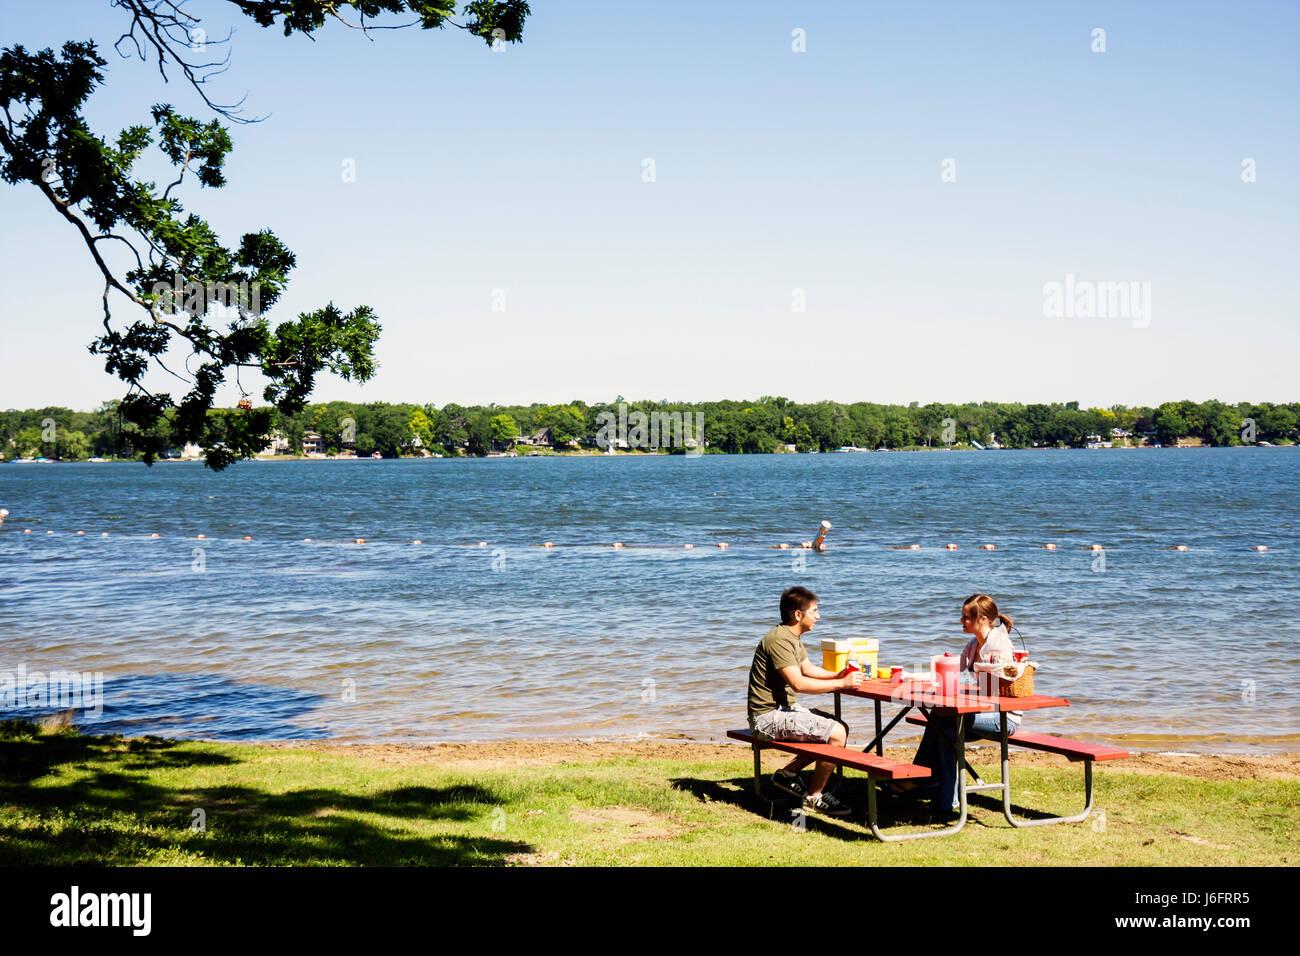 Wisconsin Kenosha Paddock Lake Old Settlers Park Asian man woman couple picnic bench lakeshore outdoor recreation - Stock Image